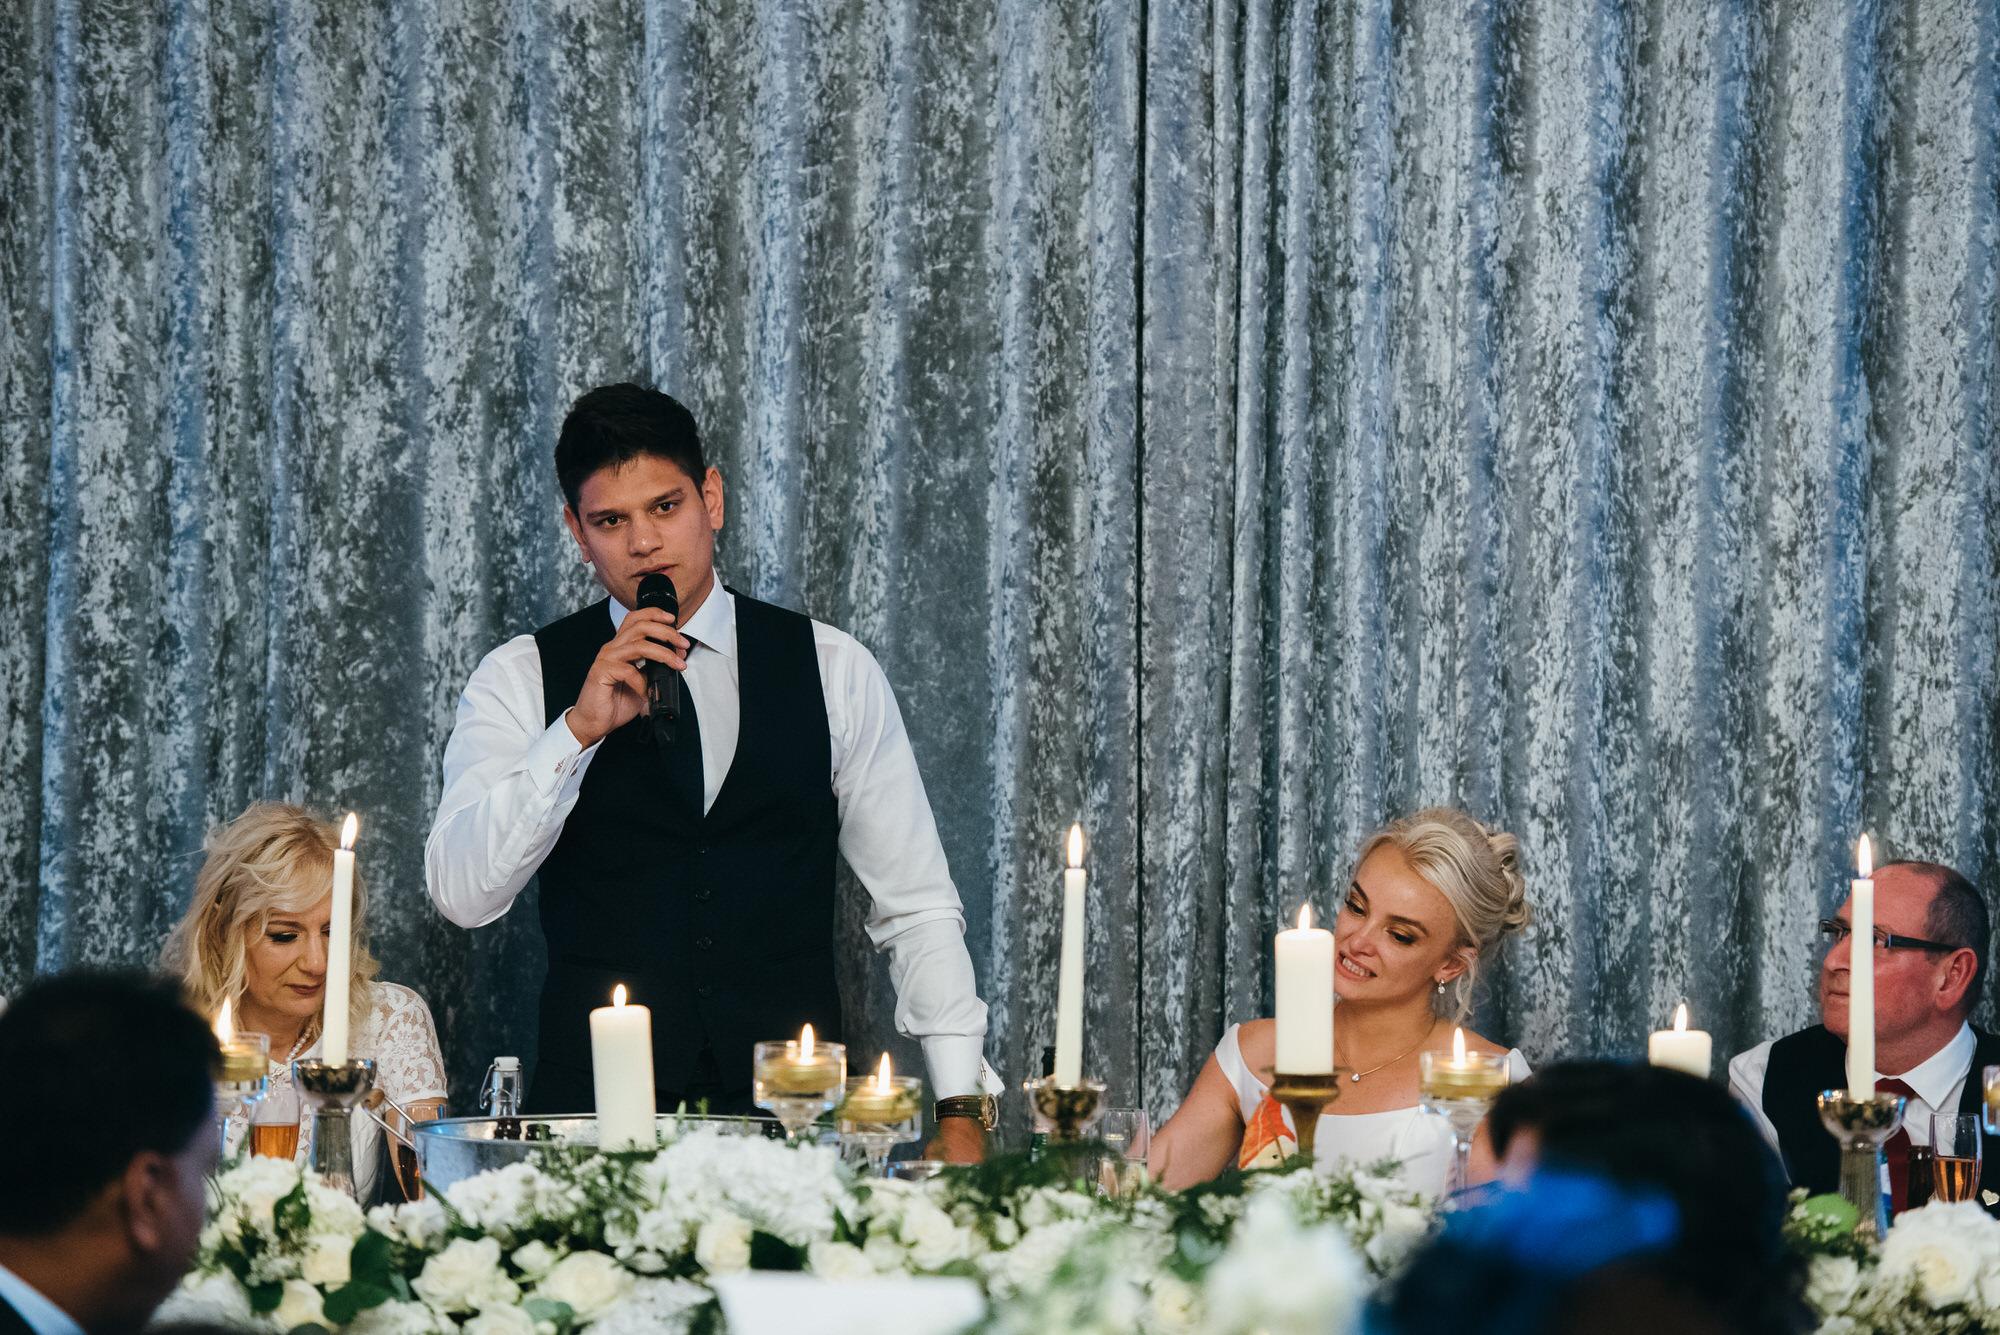 Merrydale manor wedding photography 089